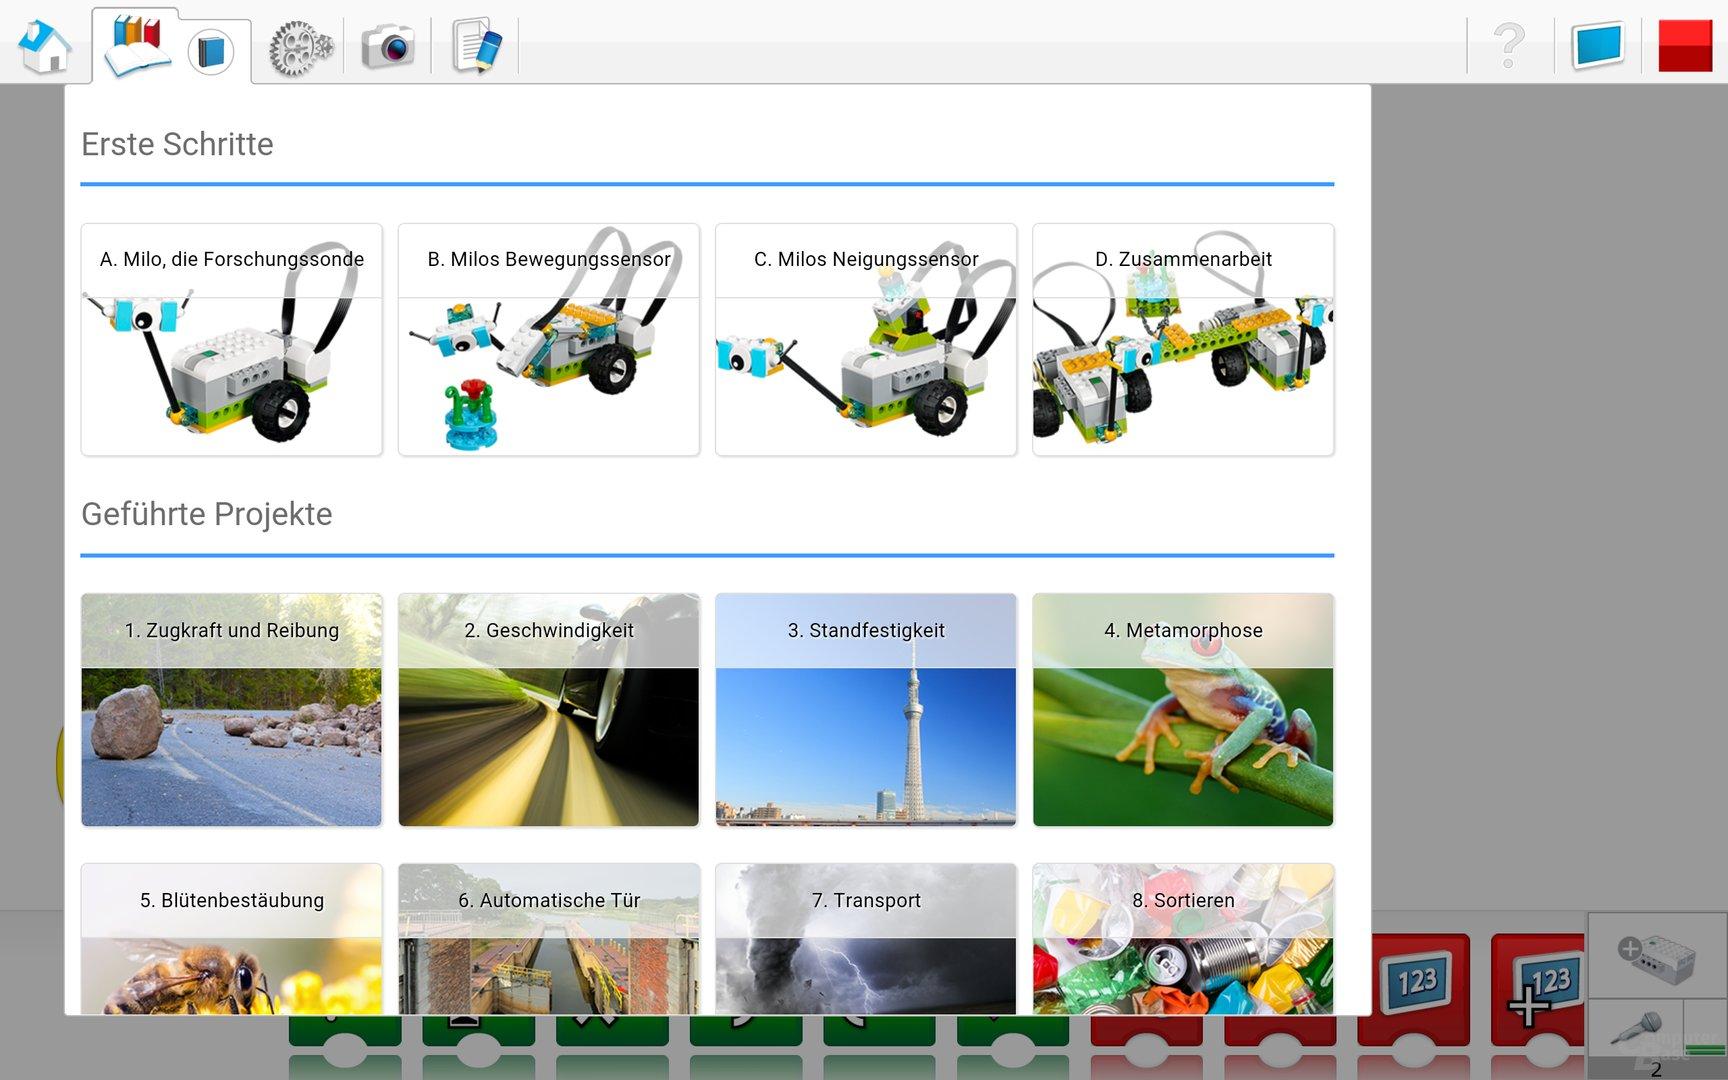 Lego WeDo 2.0 Android App – Projekte